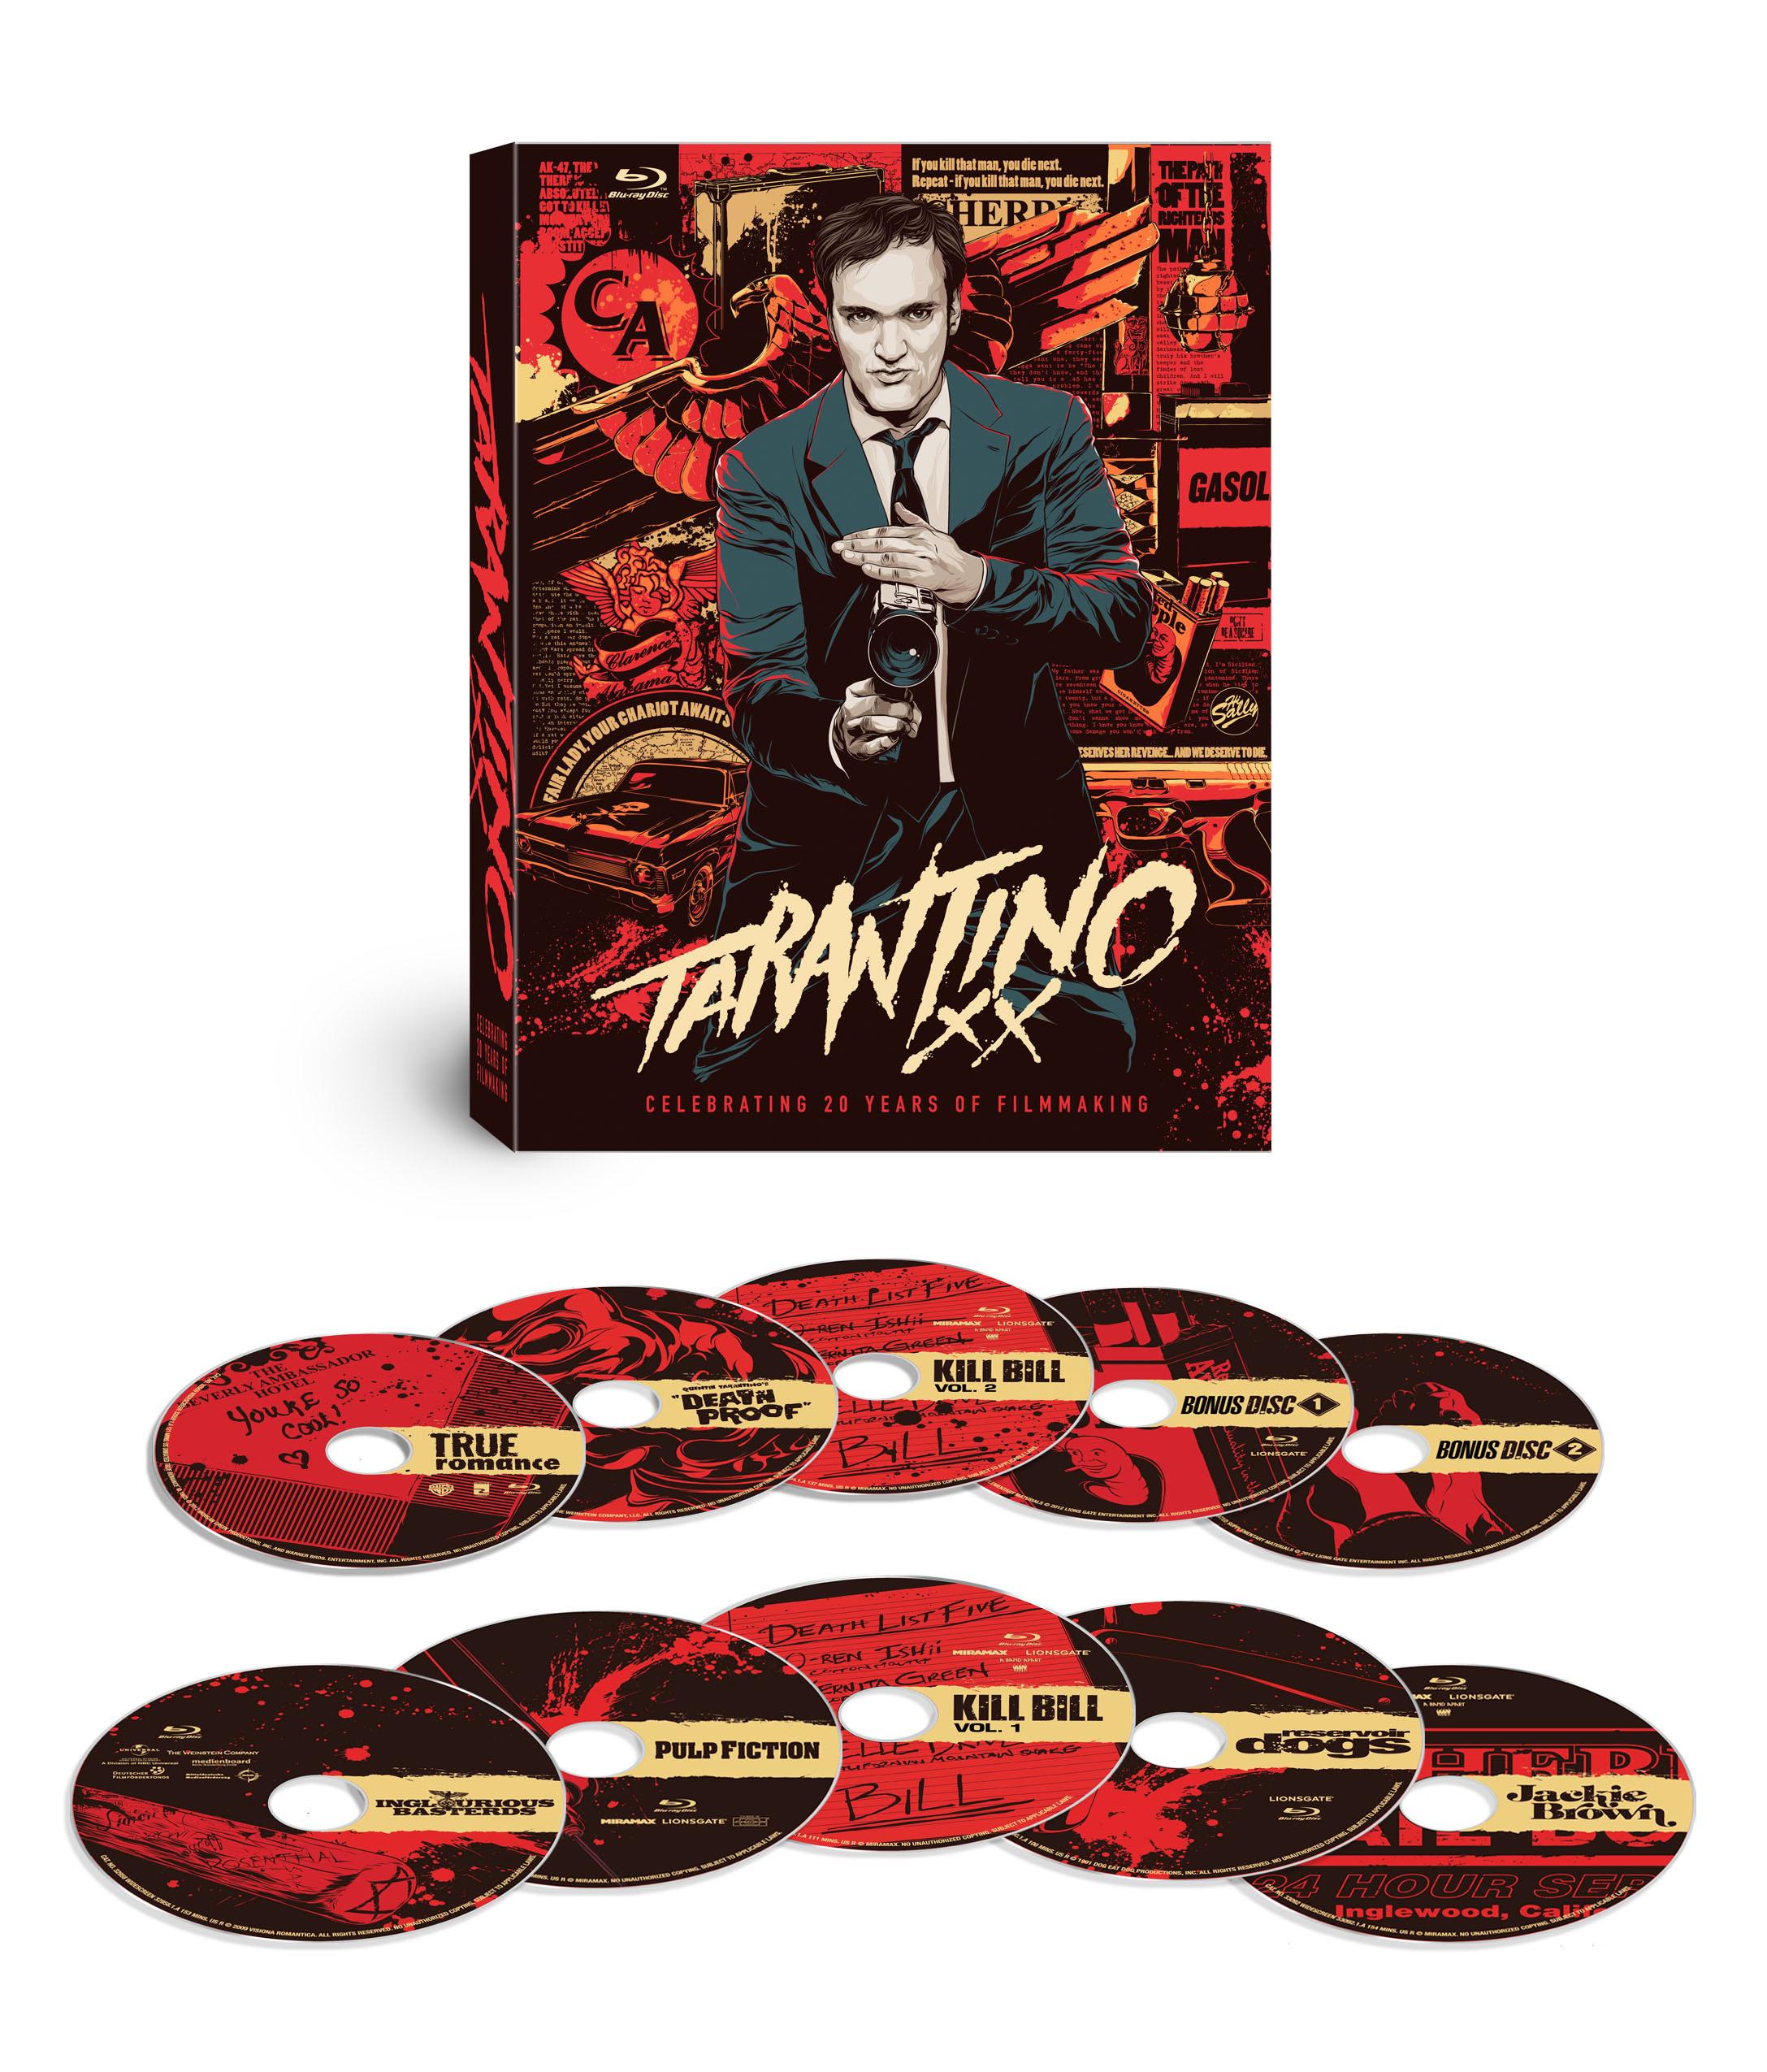 Tarantino XX, The Expendables 2 on DVD Tuesday 11/20/12